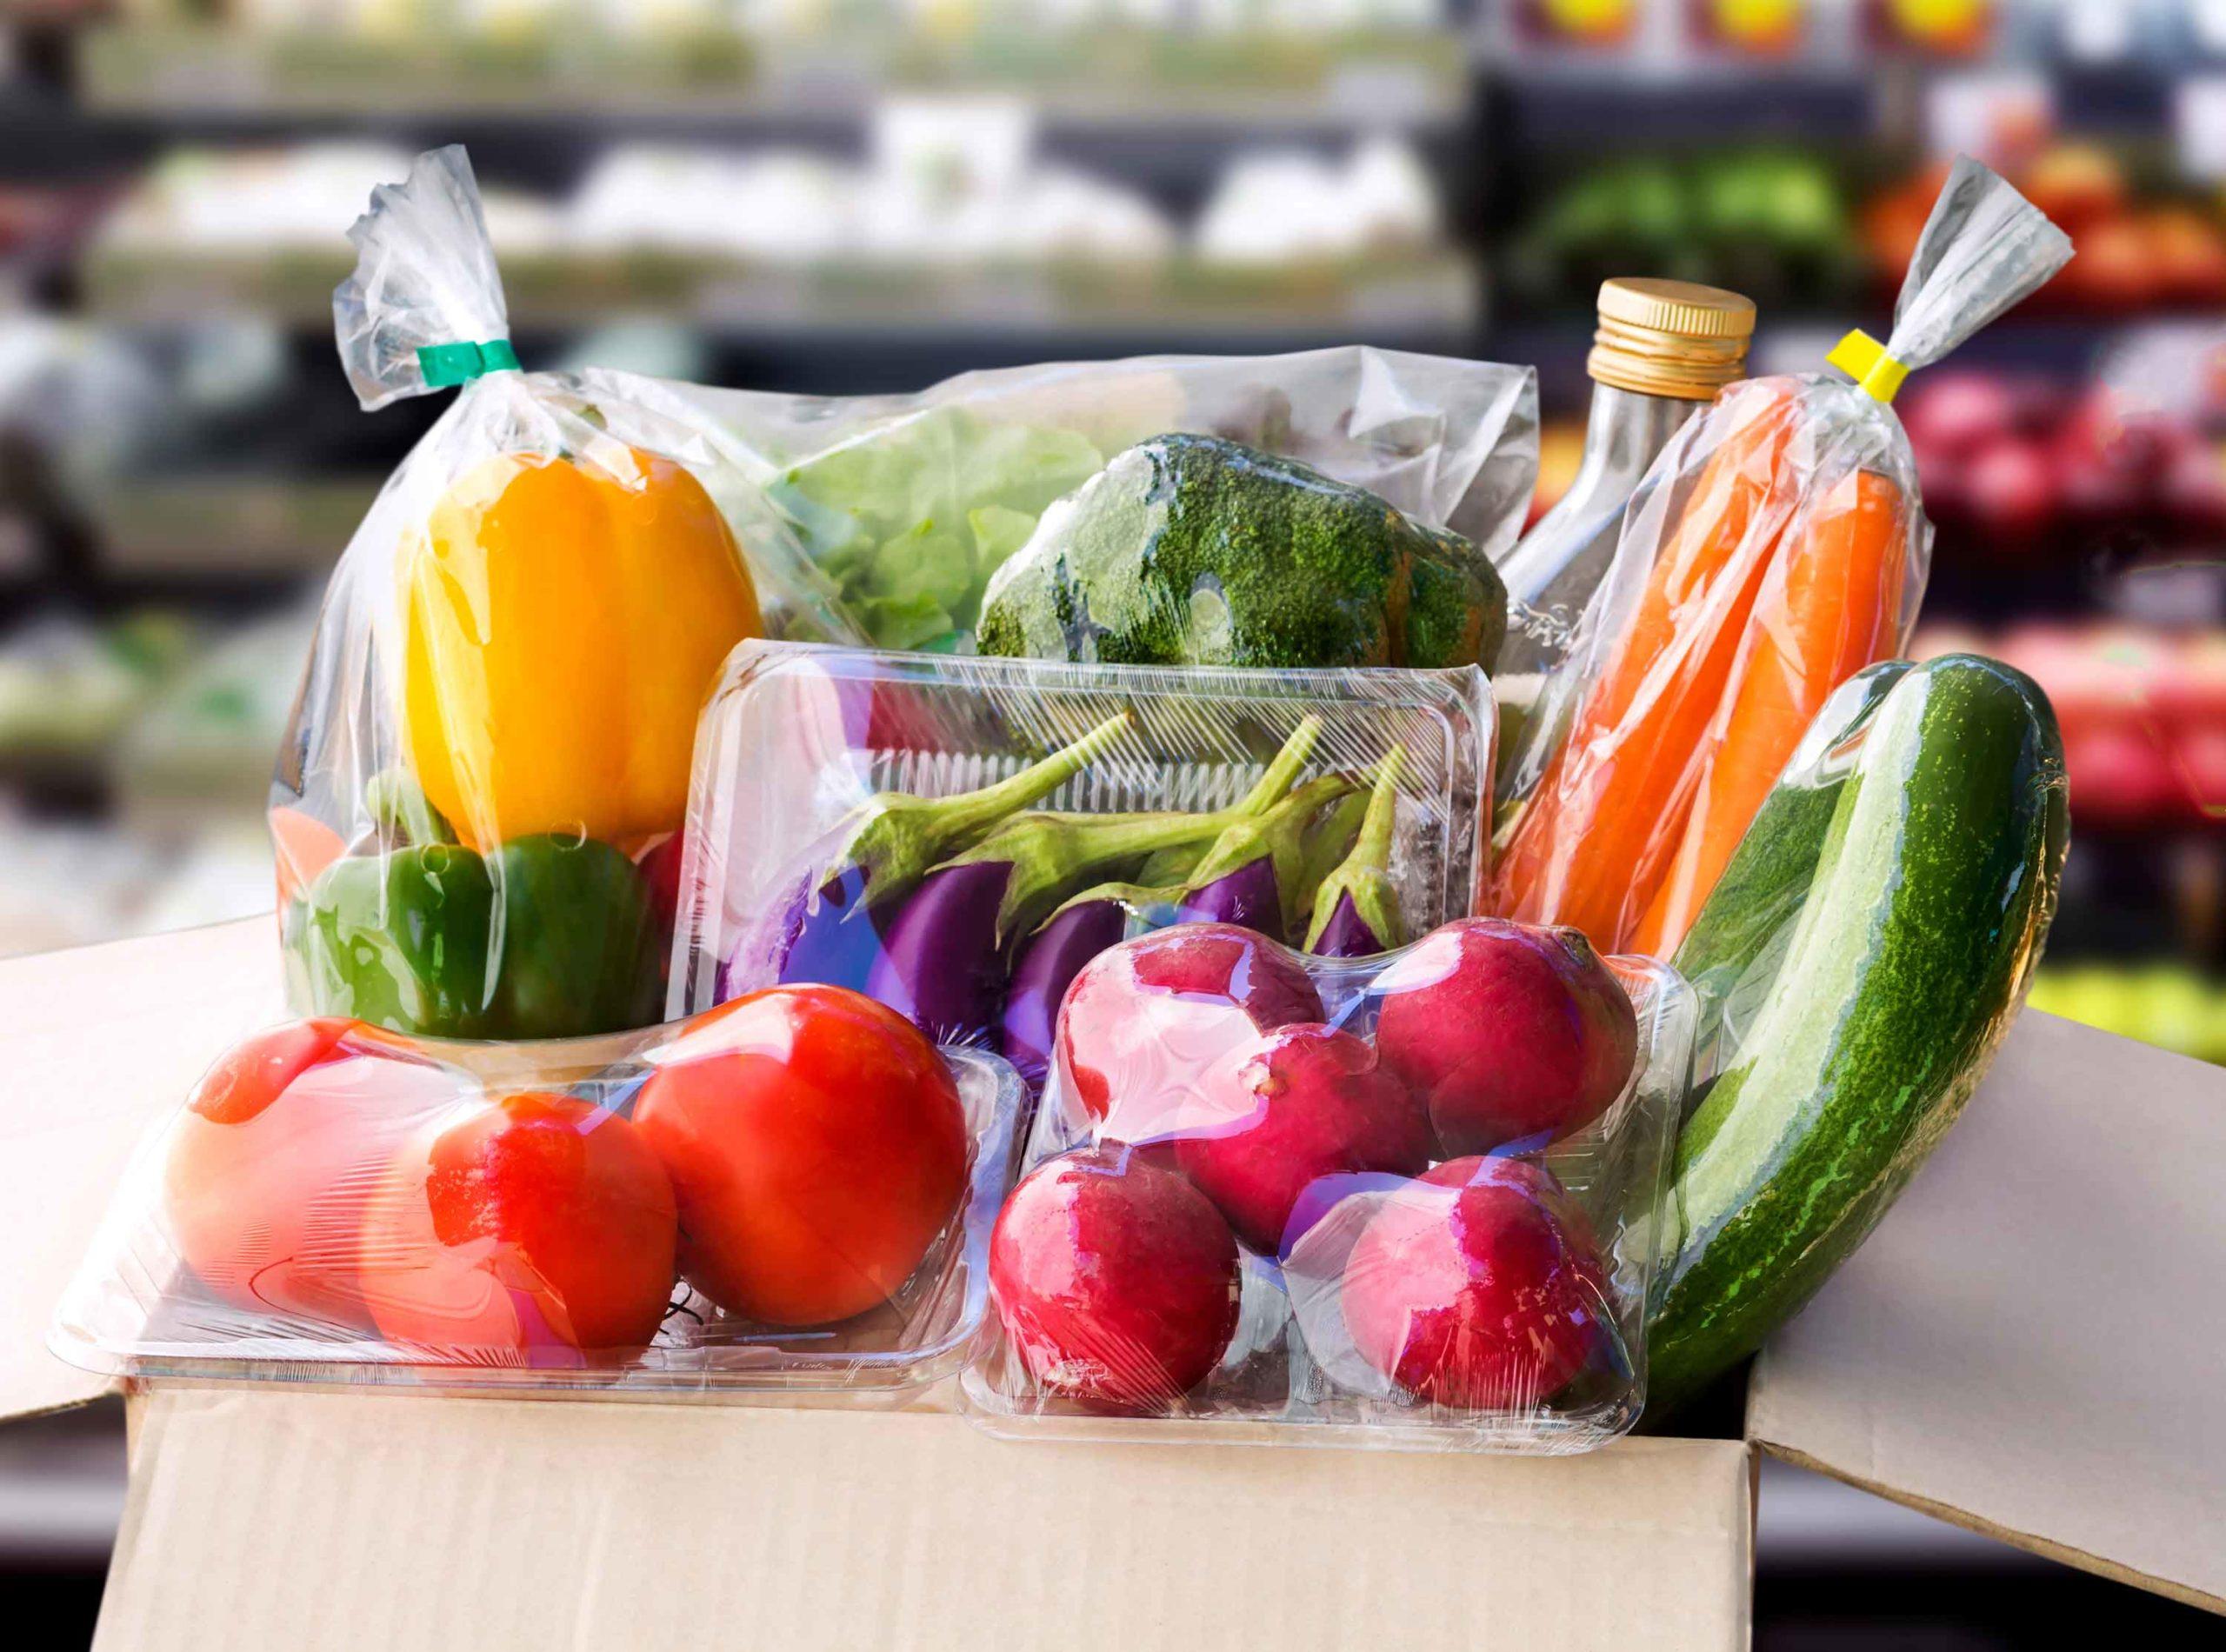 Vegetables-in-plastic